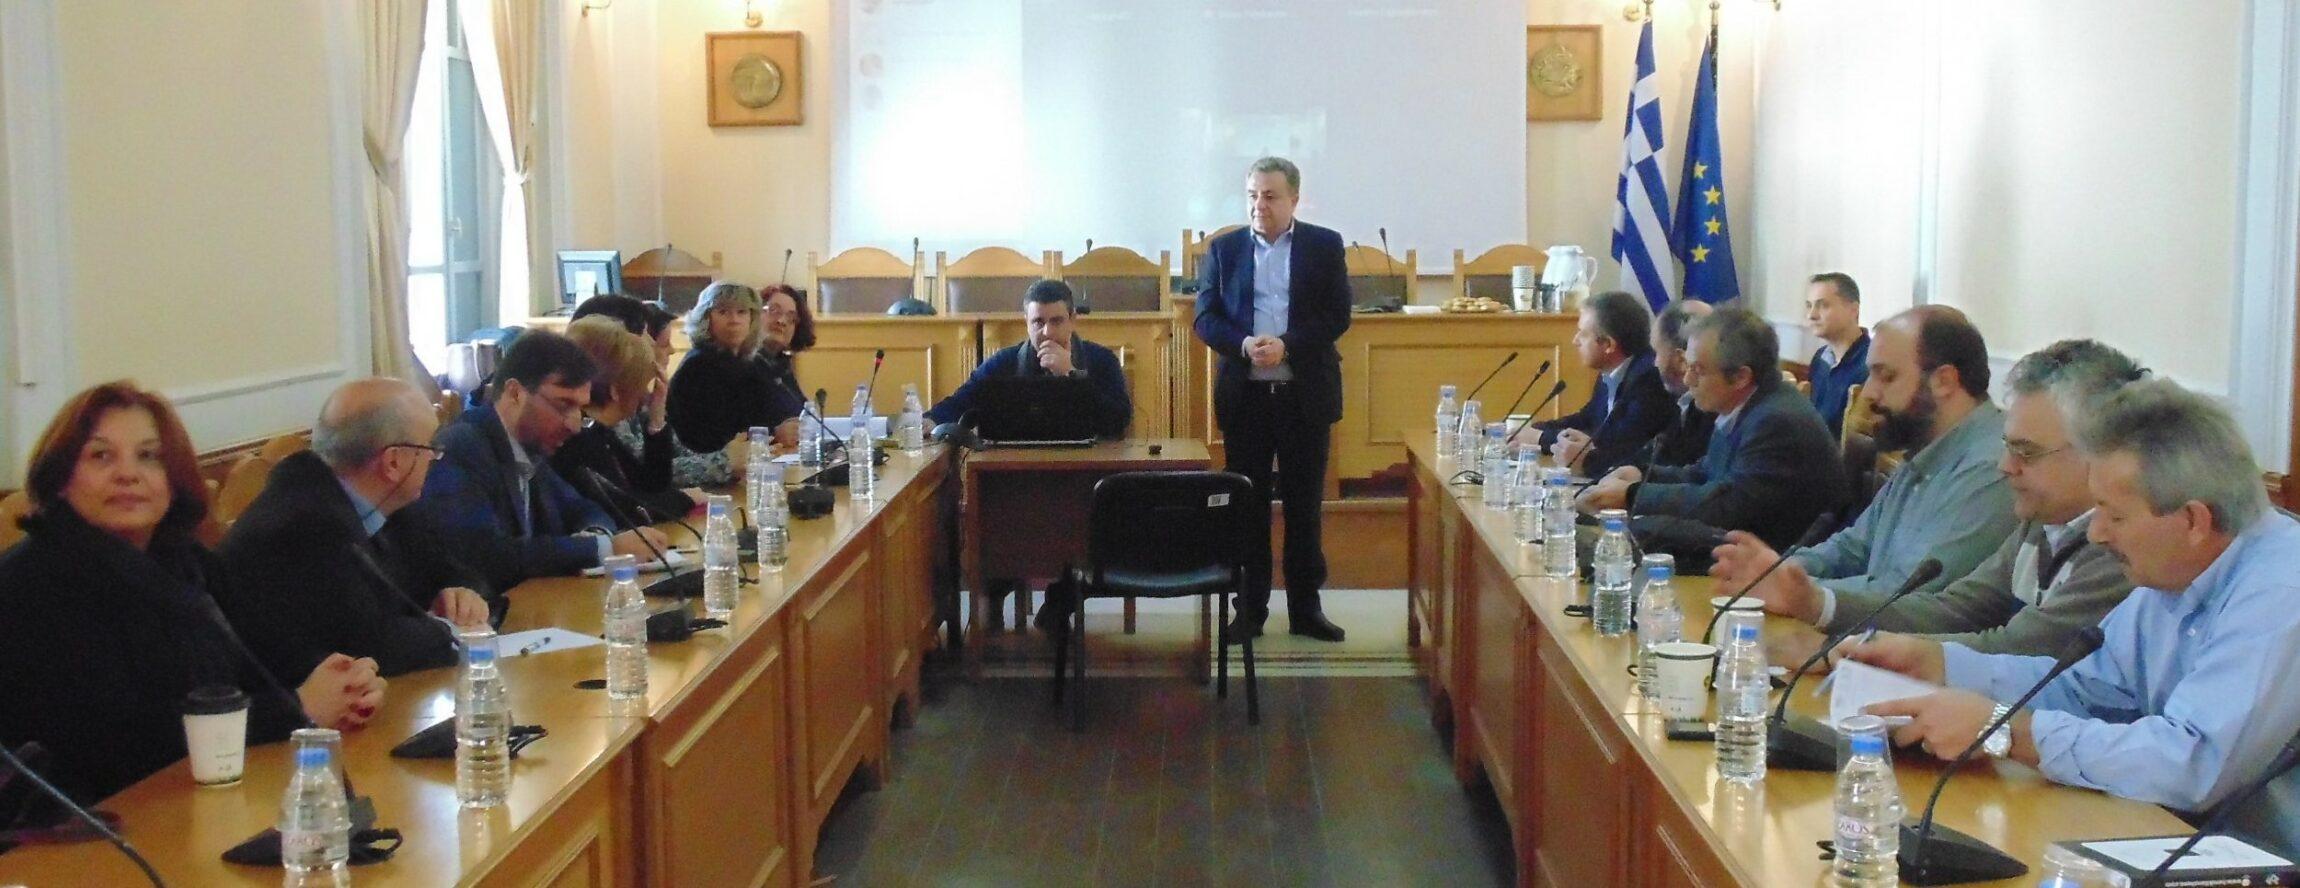 Crete Regional Development Fund: Insular multi-level governance for clean energy transition